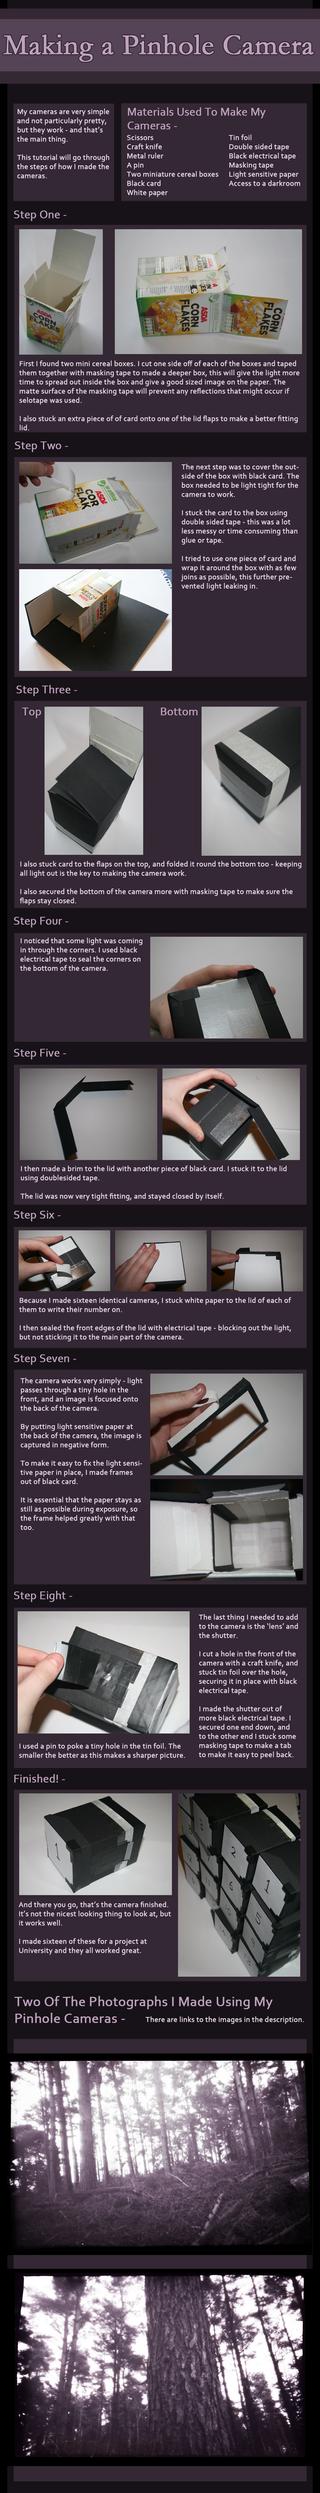 How To Make A Pinhole Camera by seasonaldragon1